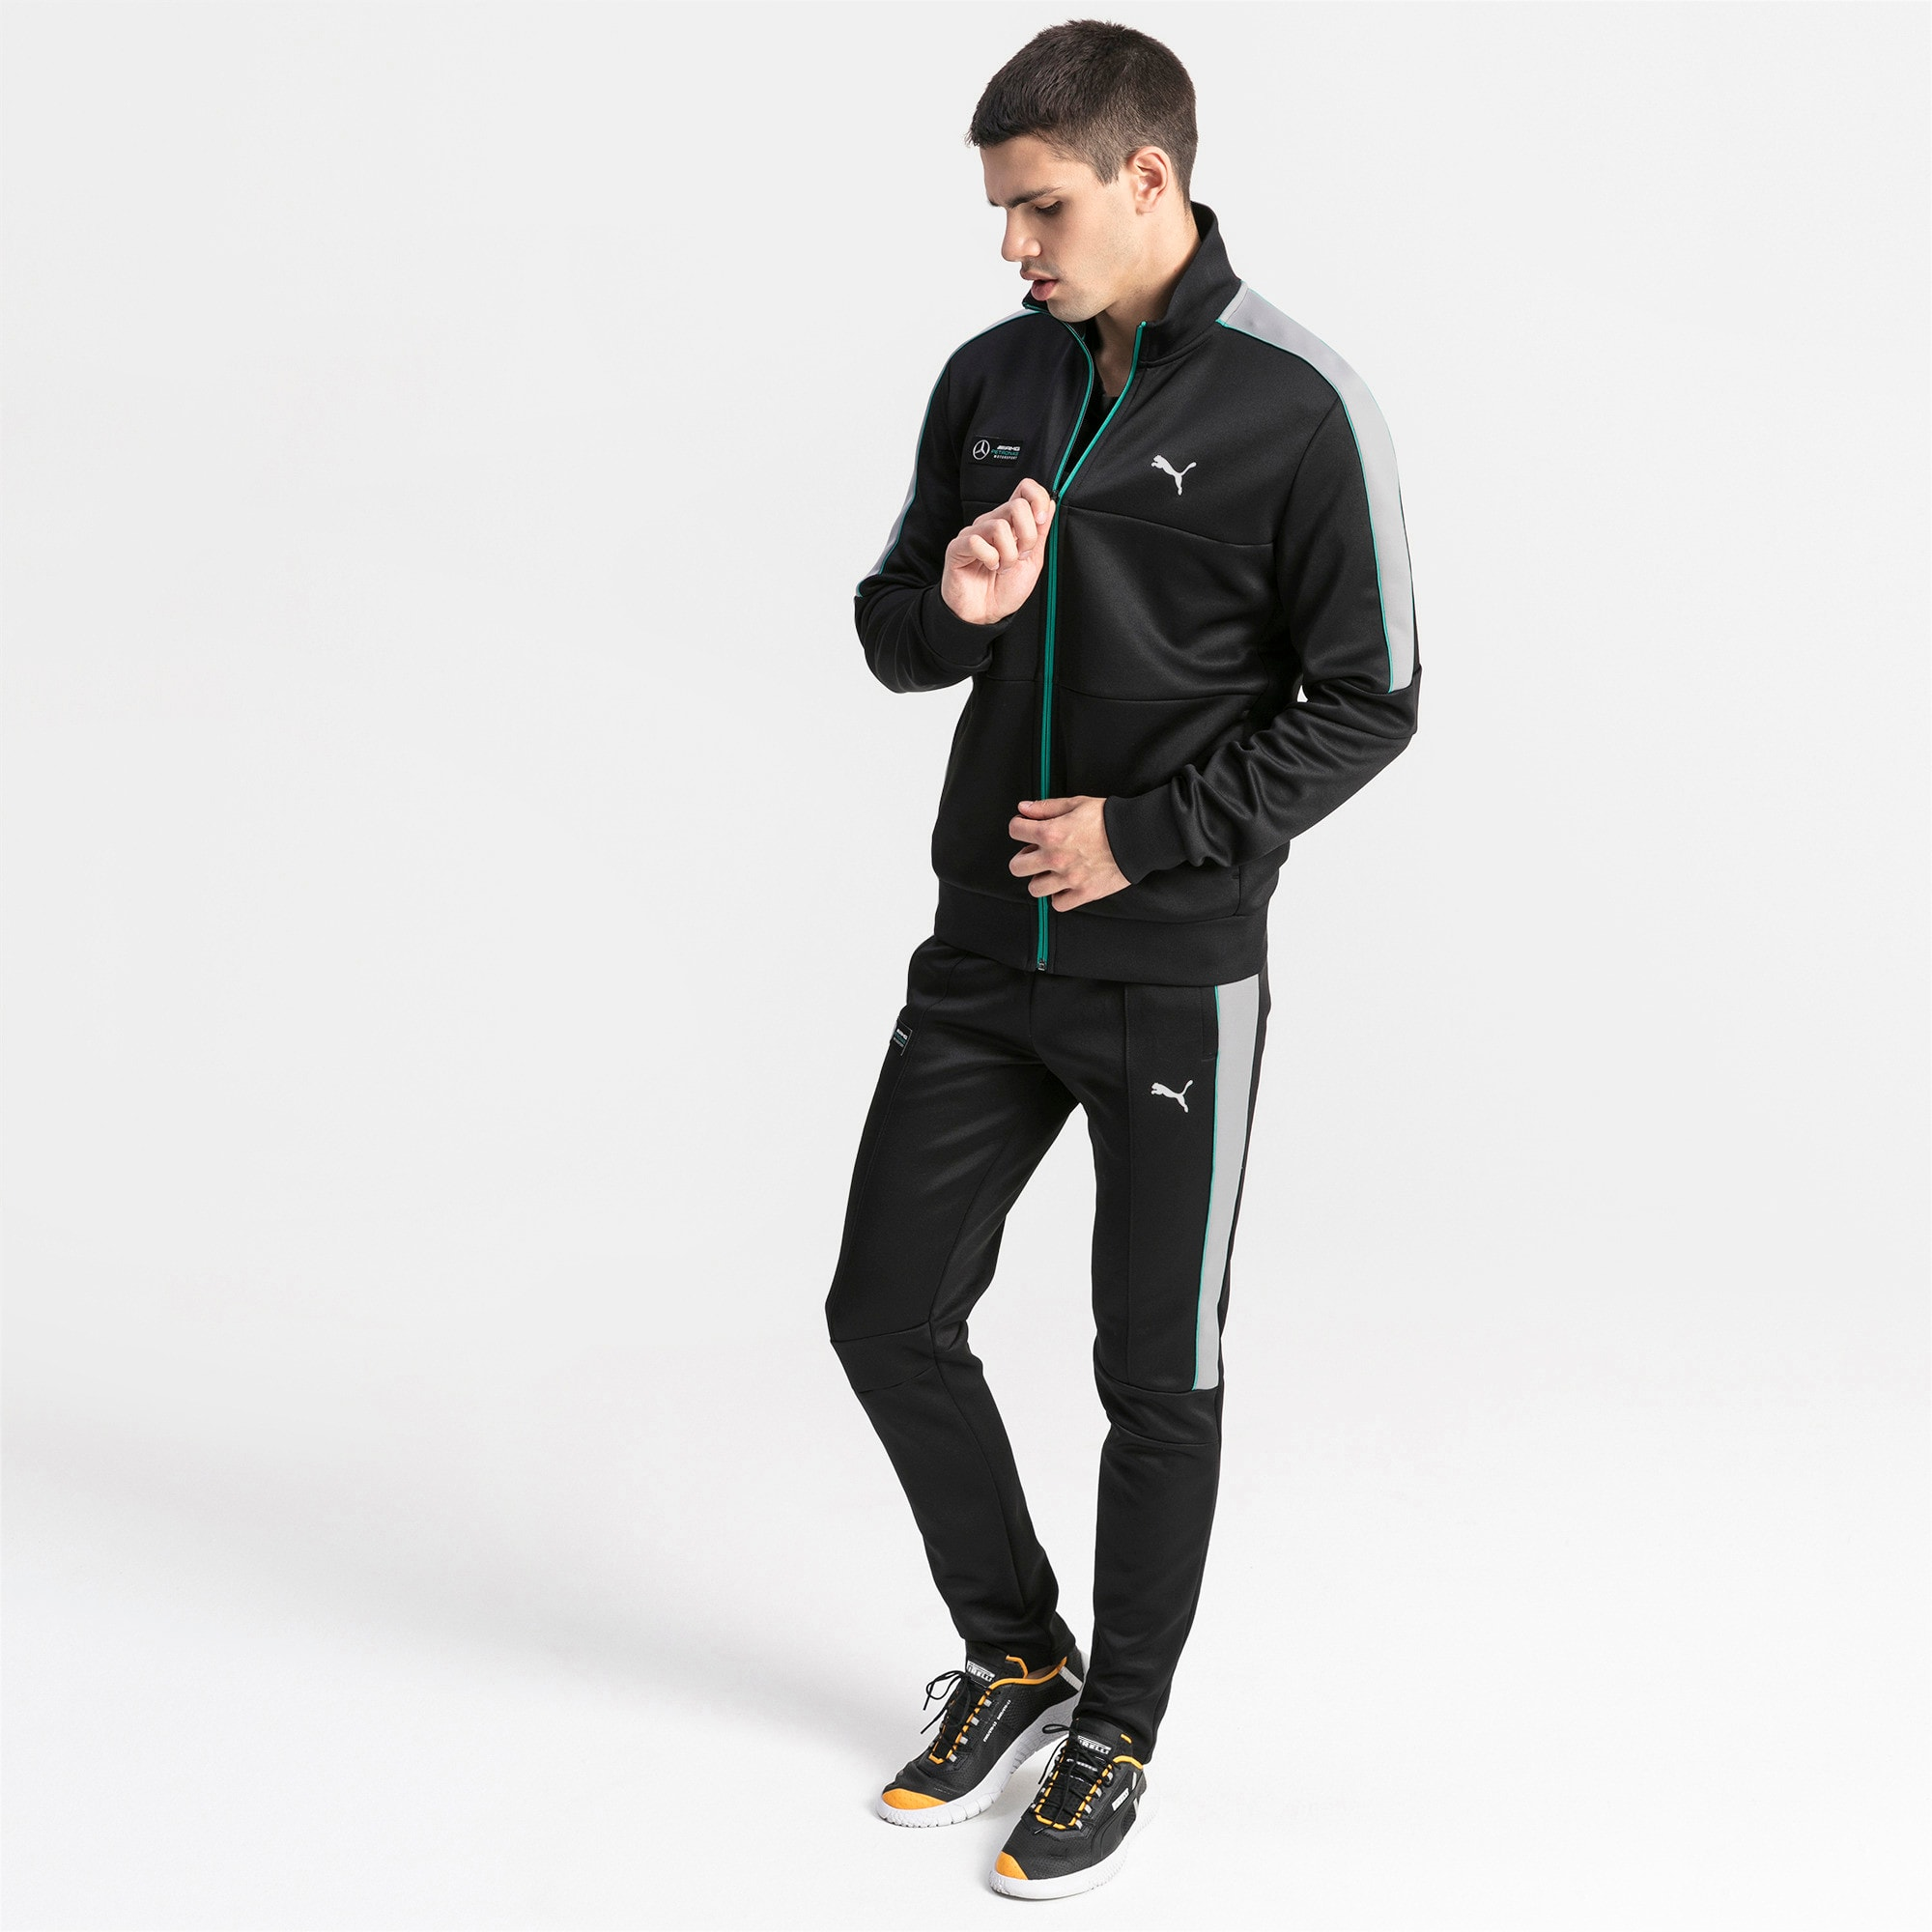 Thumbnail 3 of MAPM T7 Men's Track Jacket, Puma Black, medium